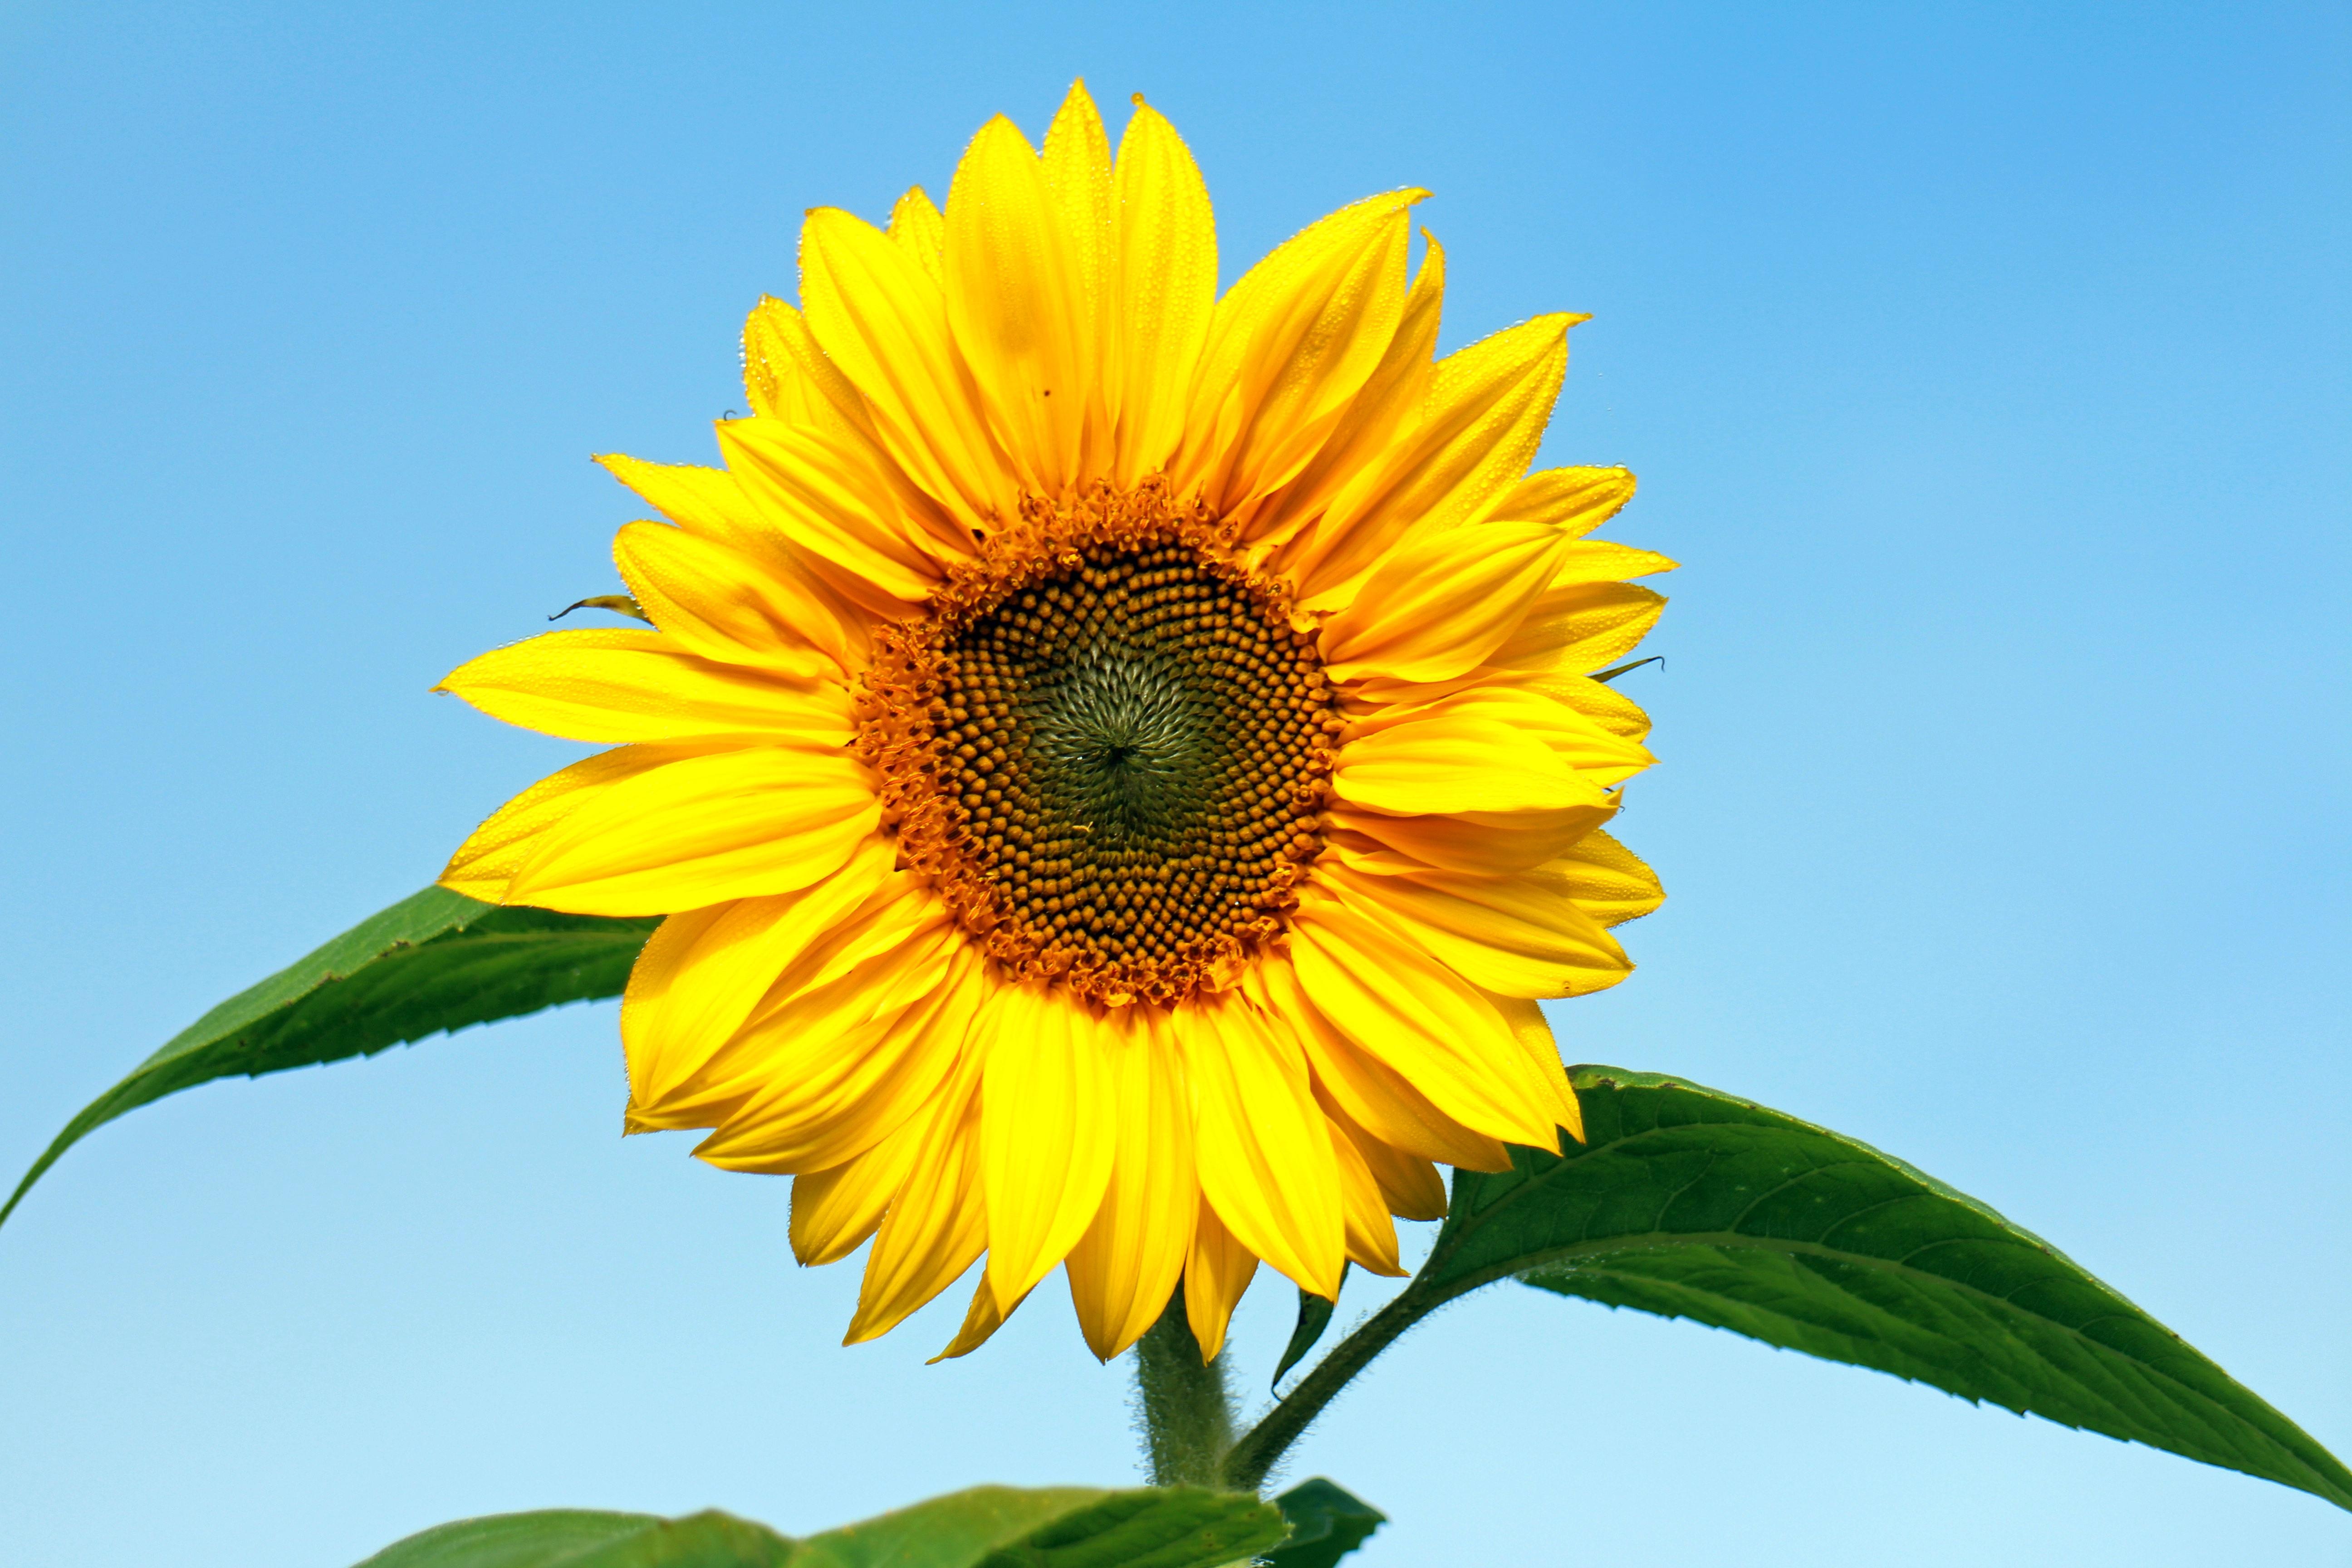 101+ Gambar Bunga Matahari Kuning Paling Baru